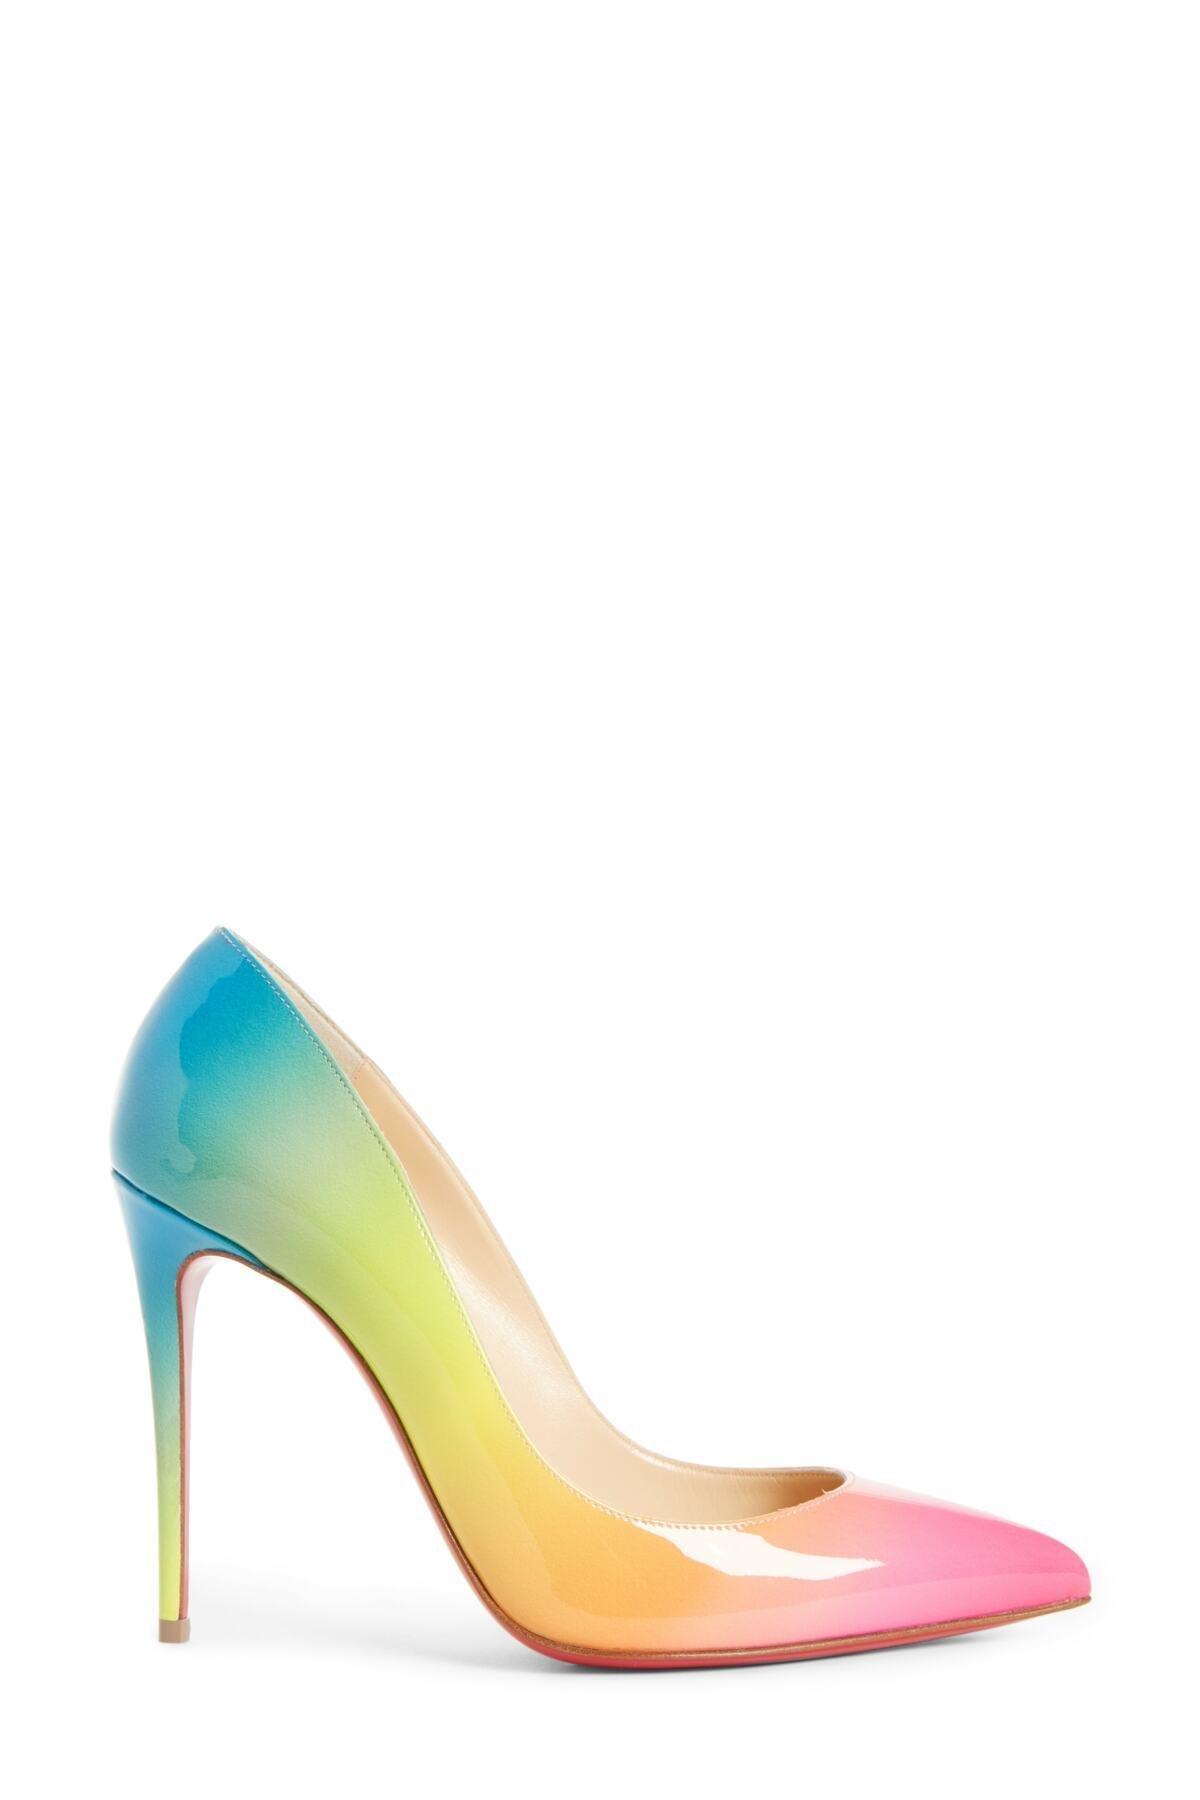 Christian Louboutin Leather Rainbow